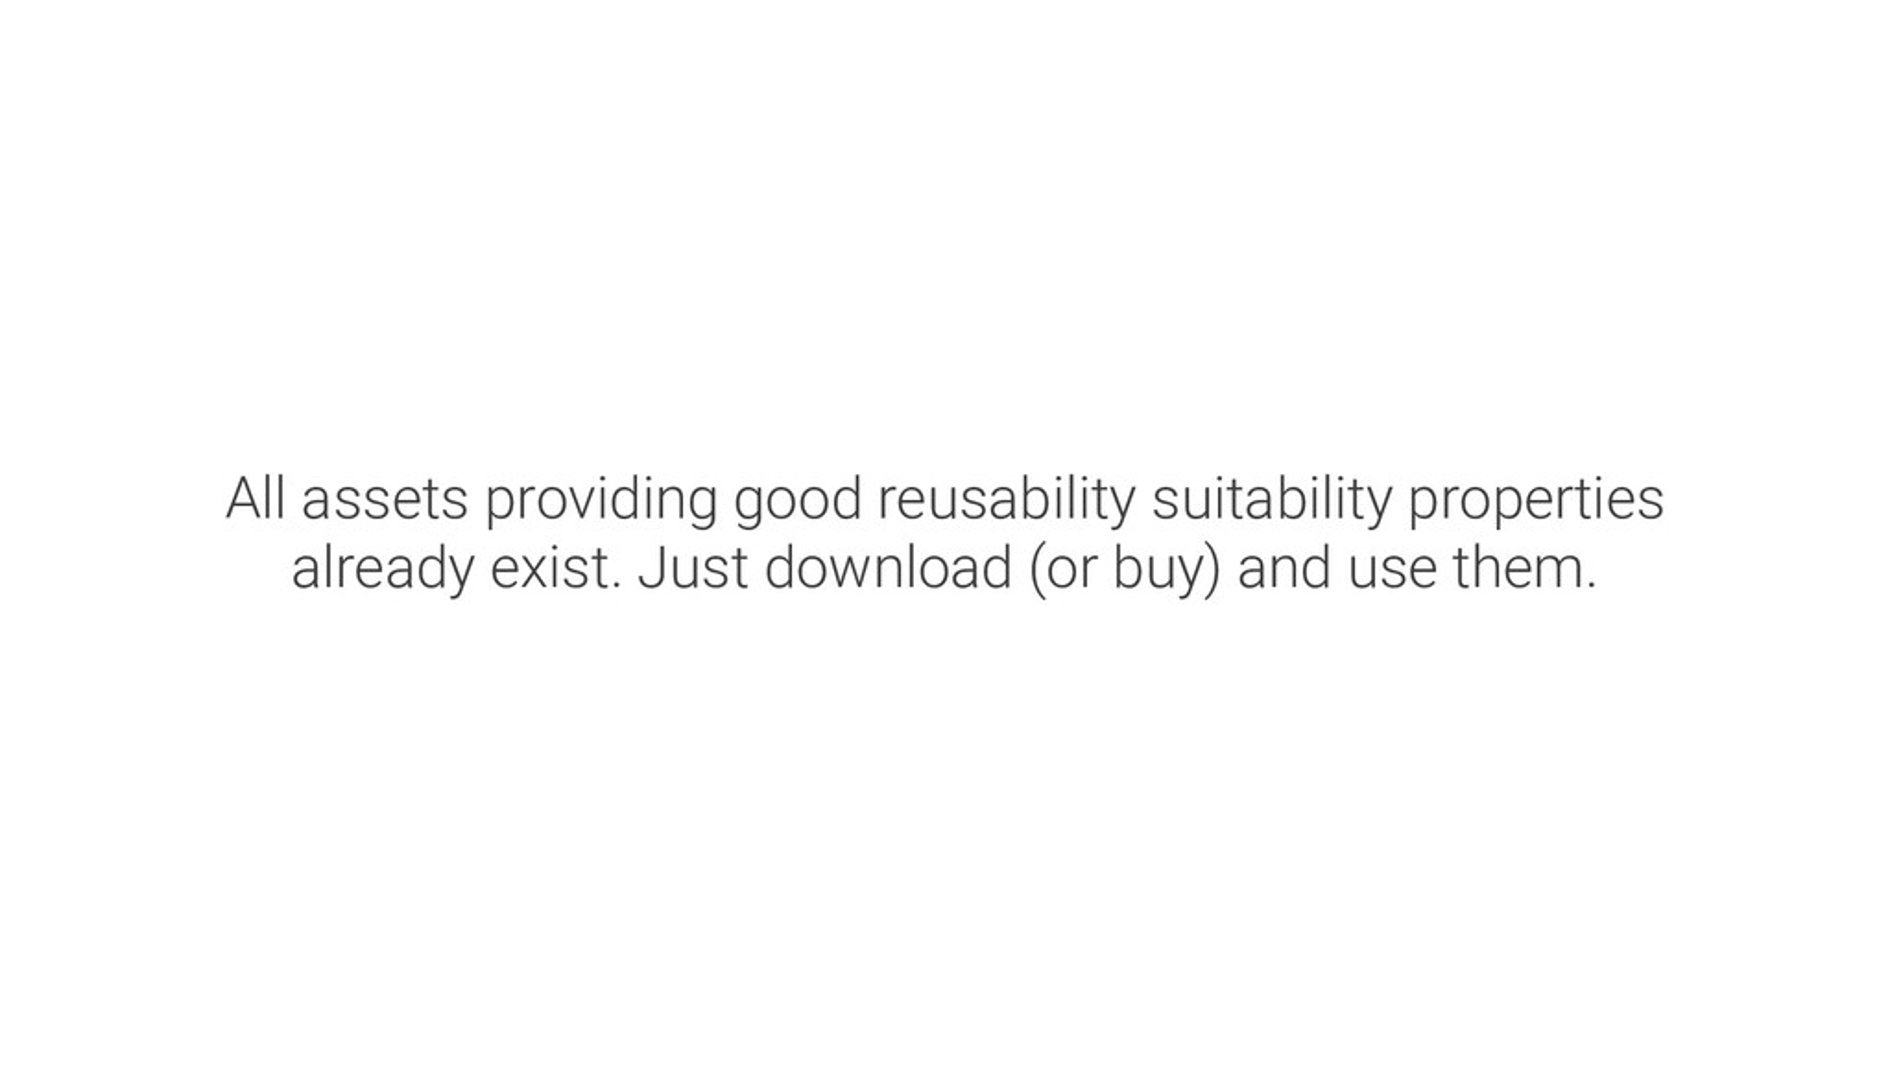 All assets providing good reusability suitabili...